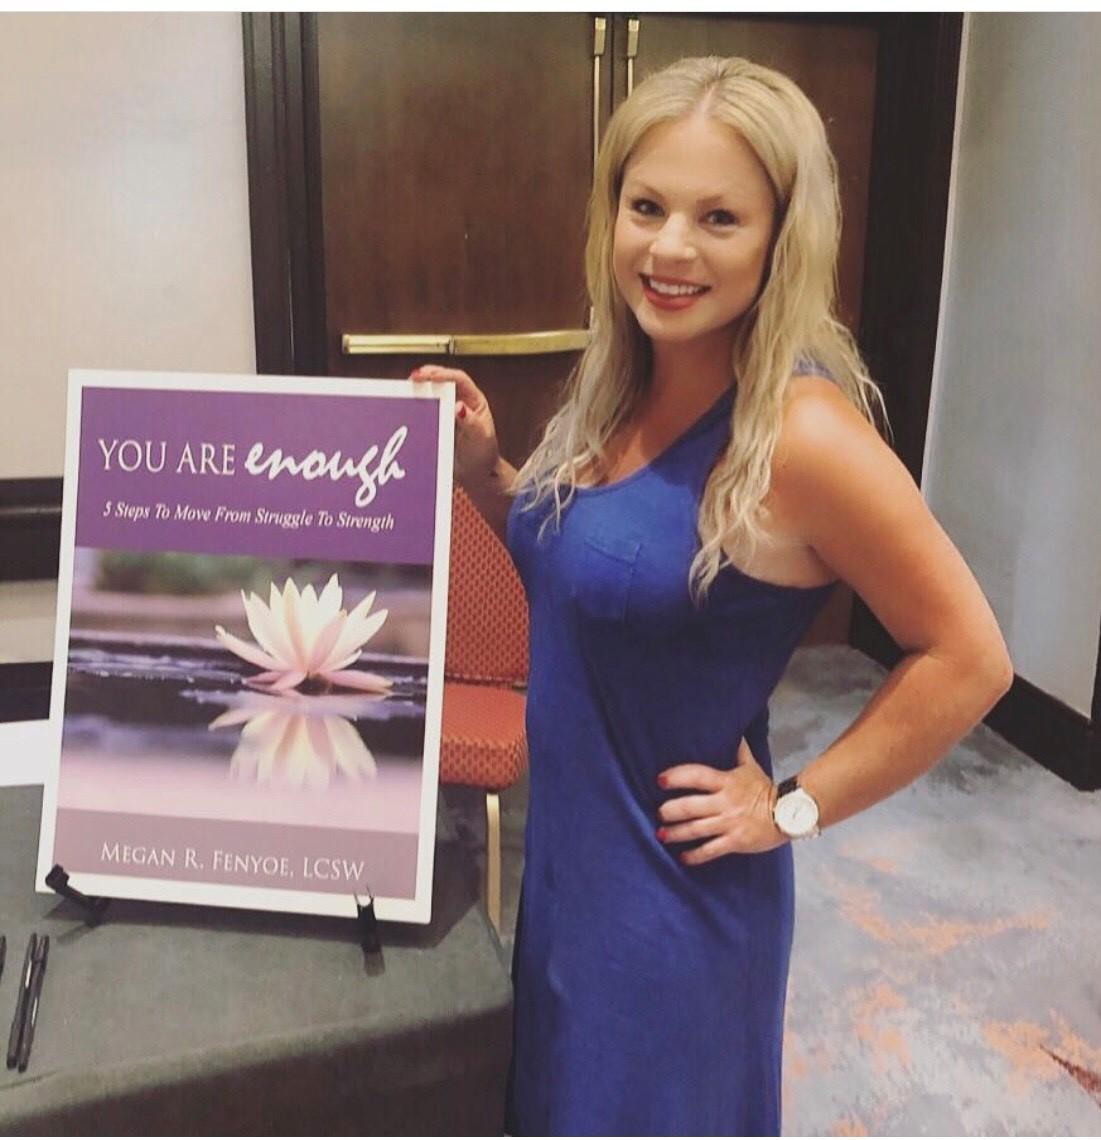 Podcast Host Megan R. Fenyoe